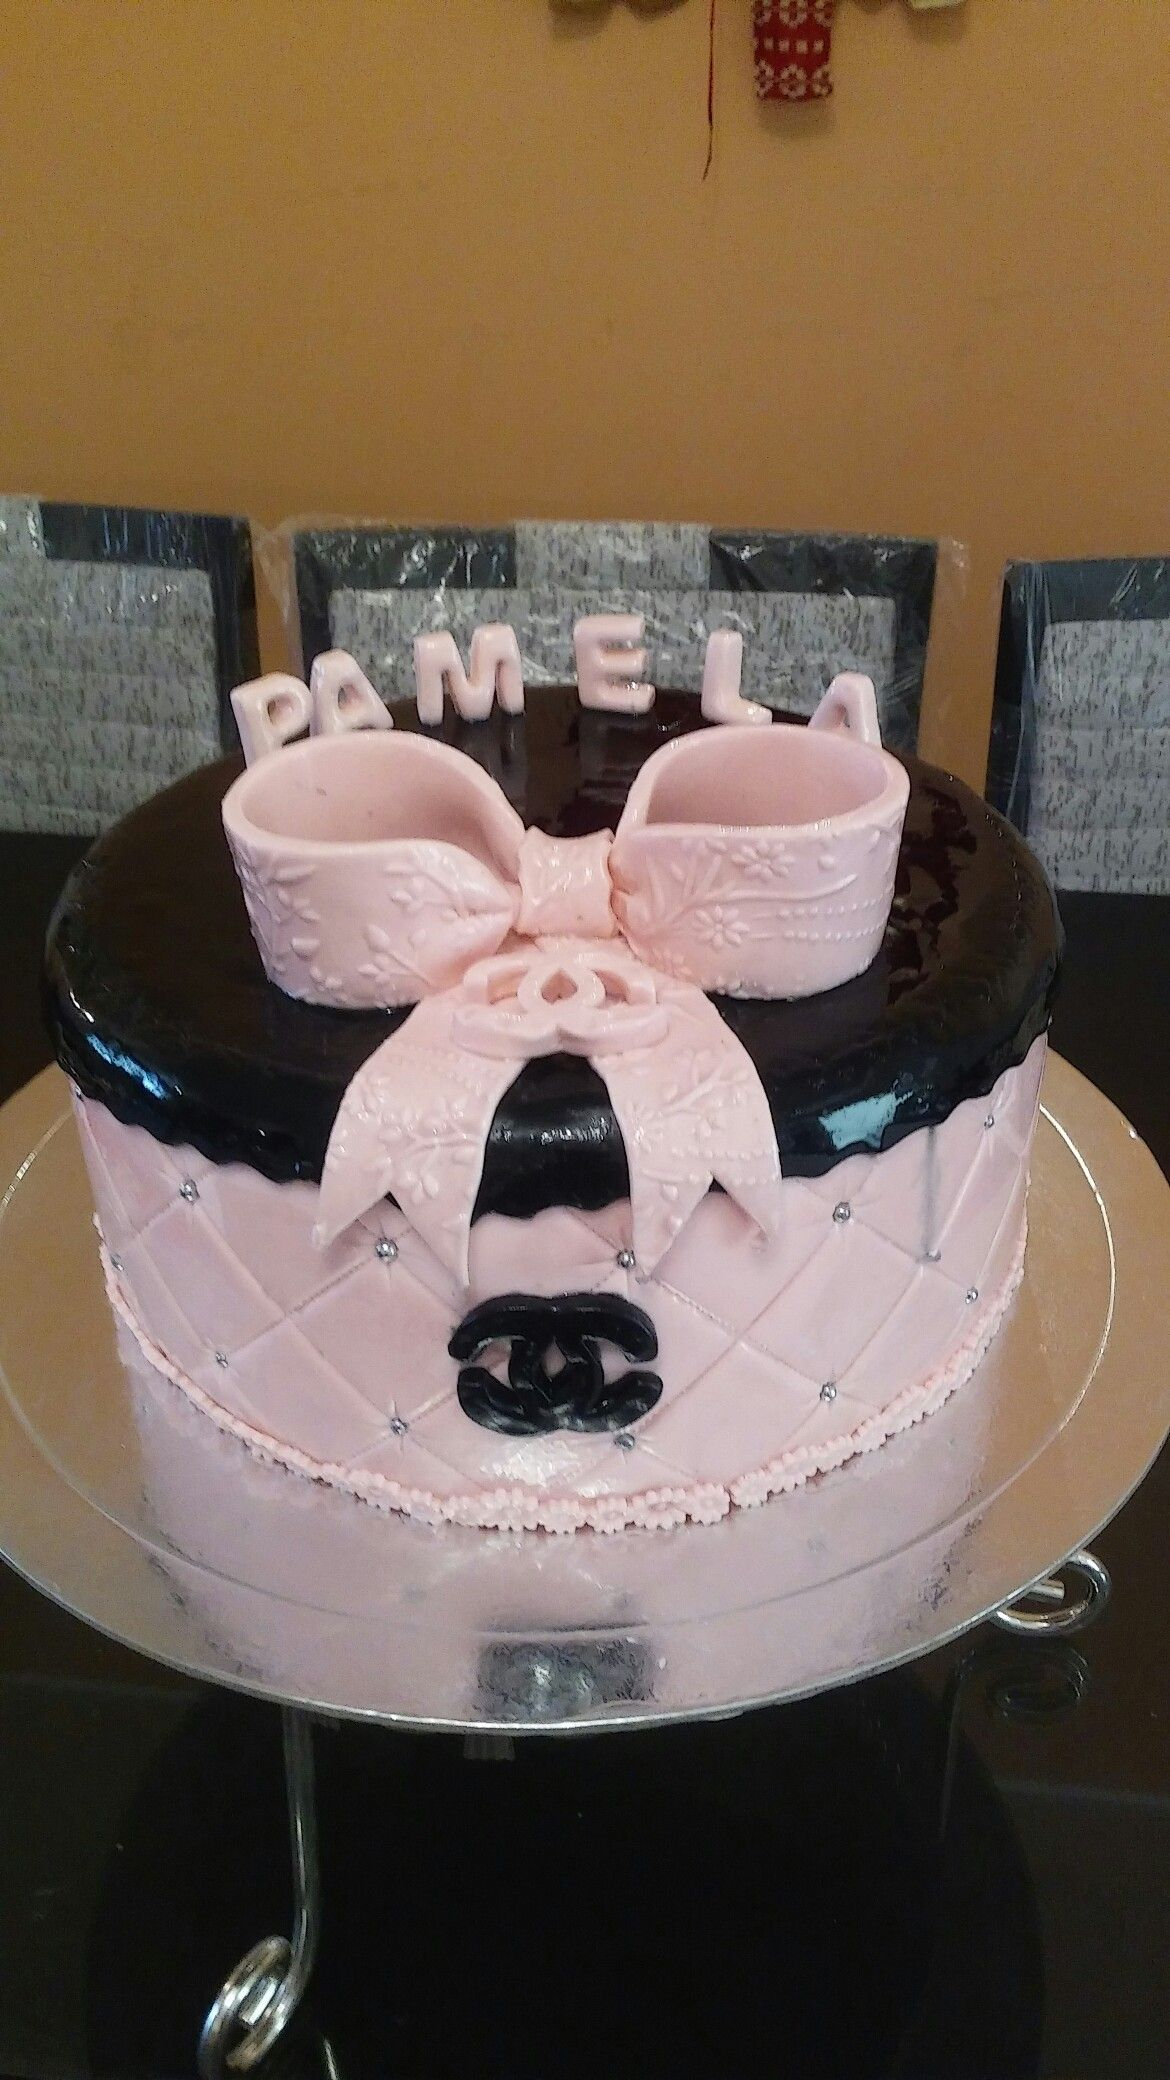 Channel Birthdays Cake Torta Channel De Cumpleaos El Deleite De